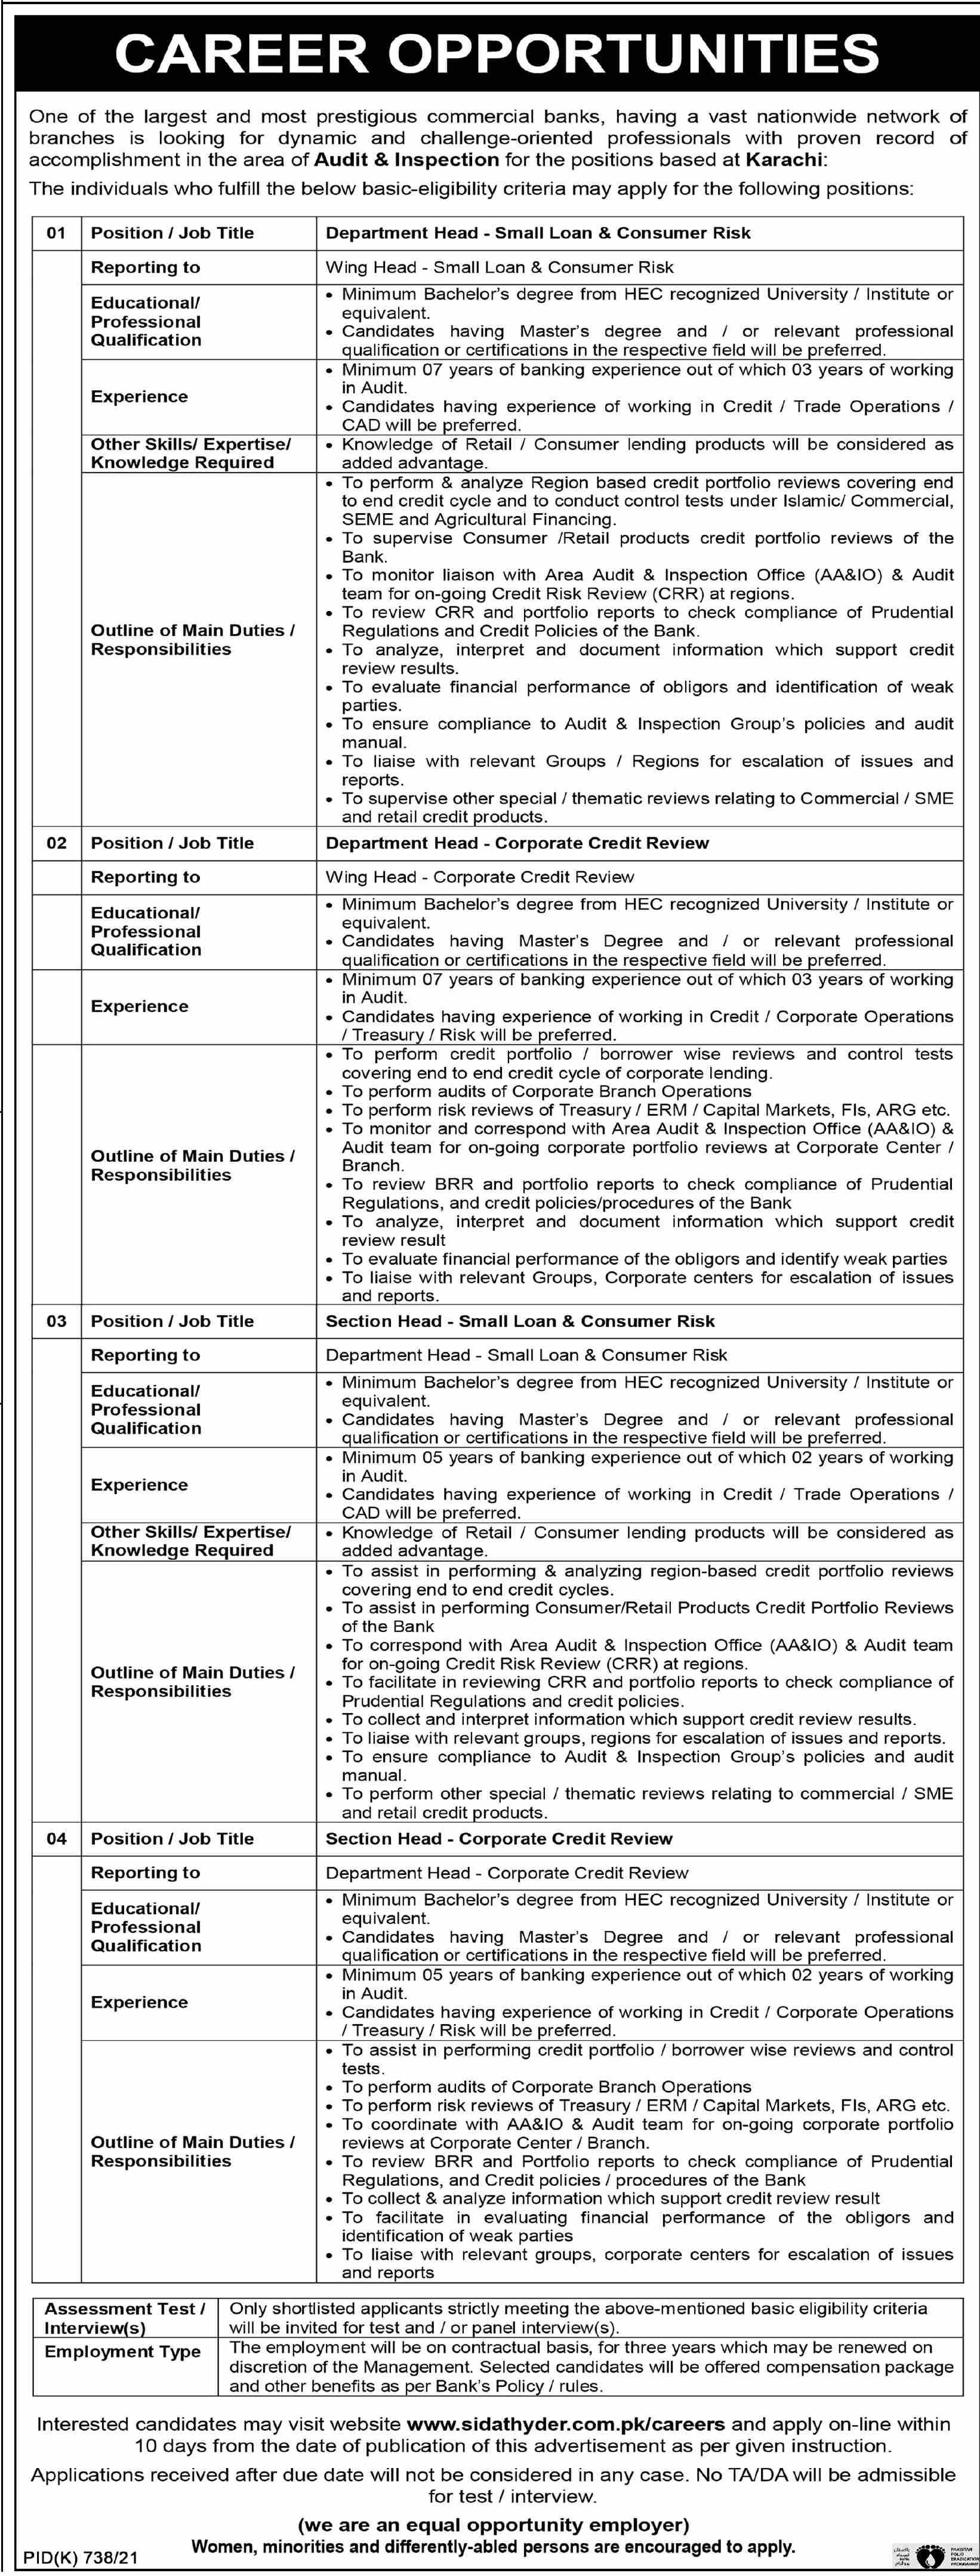 NBP Jobs 2021 Latest Advertisement of National Bank of Pakistan 3